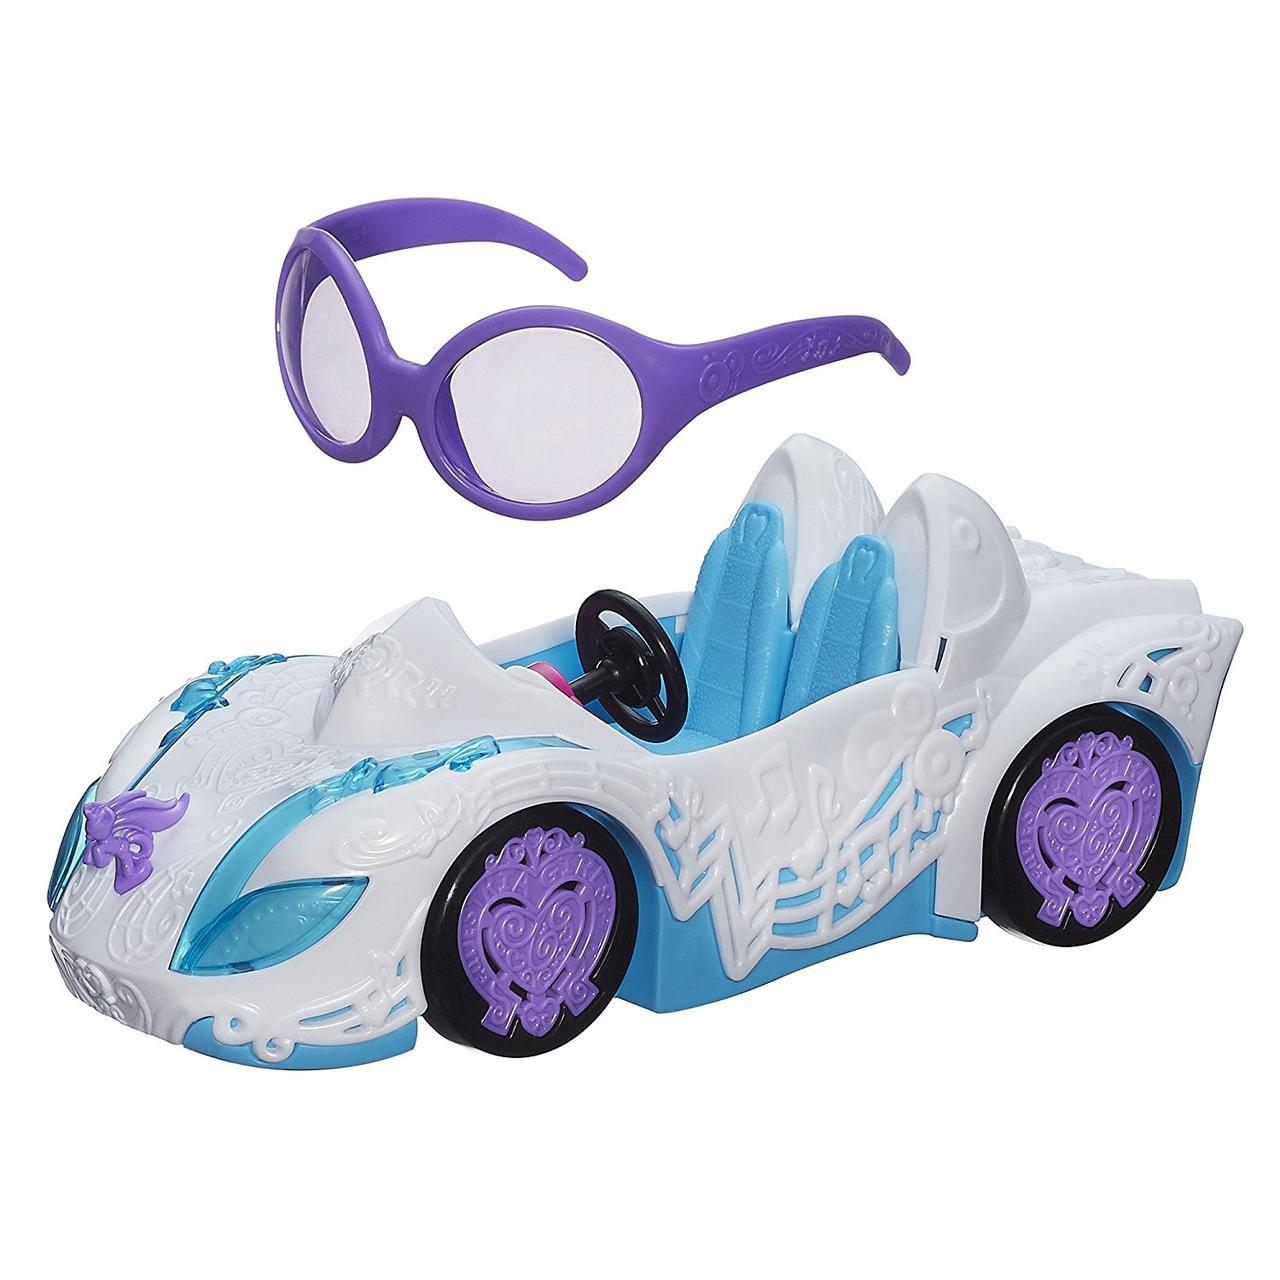 My Little Pony машина для кукол пони Девочки Эквестрии DJ Pon-3 Rockin Convertible Vehicle